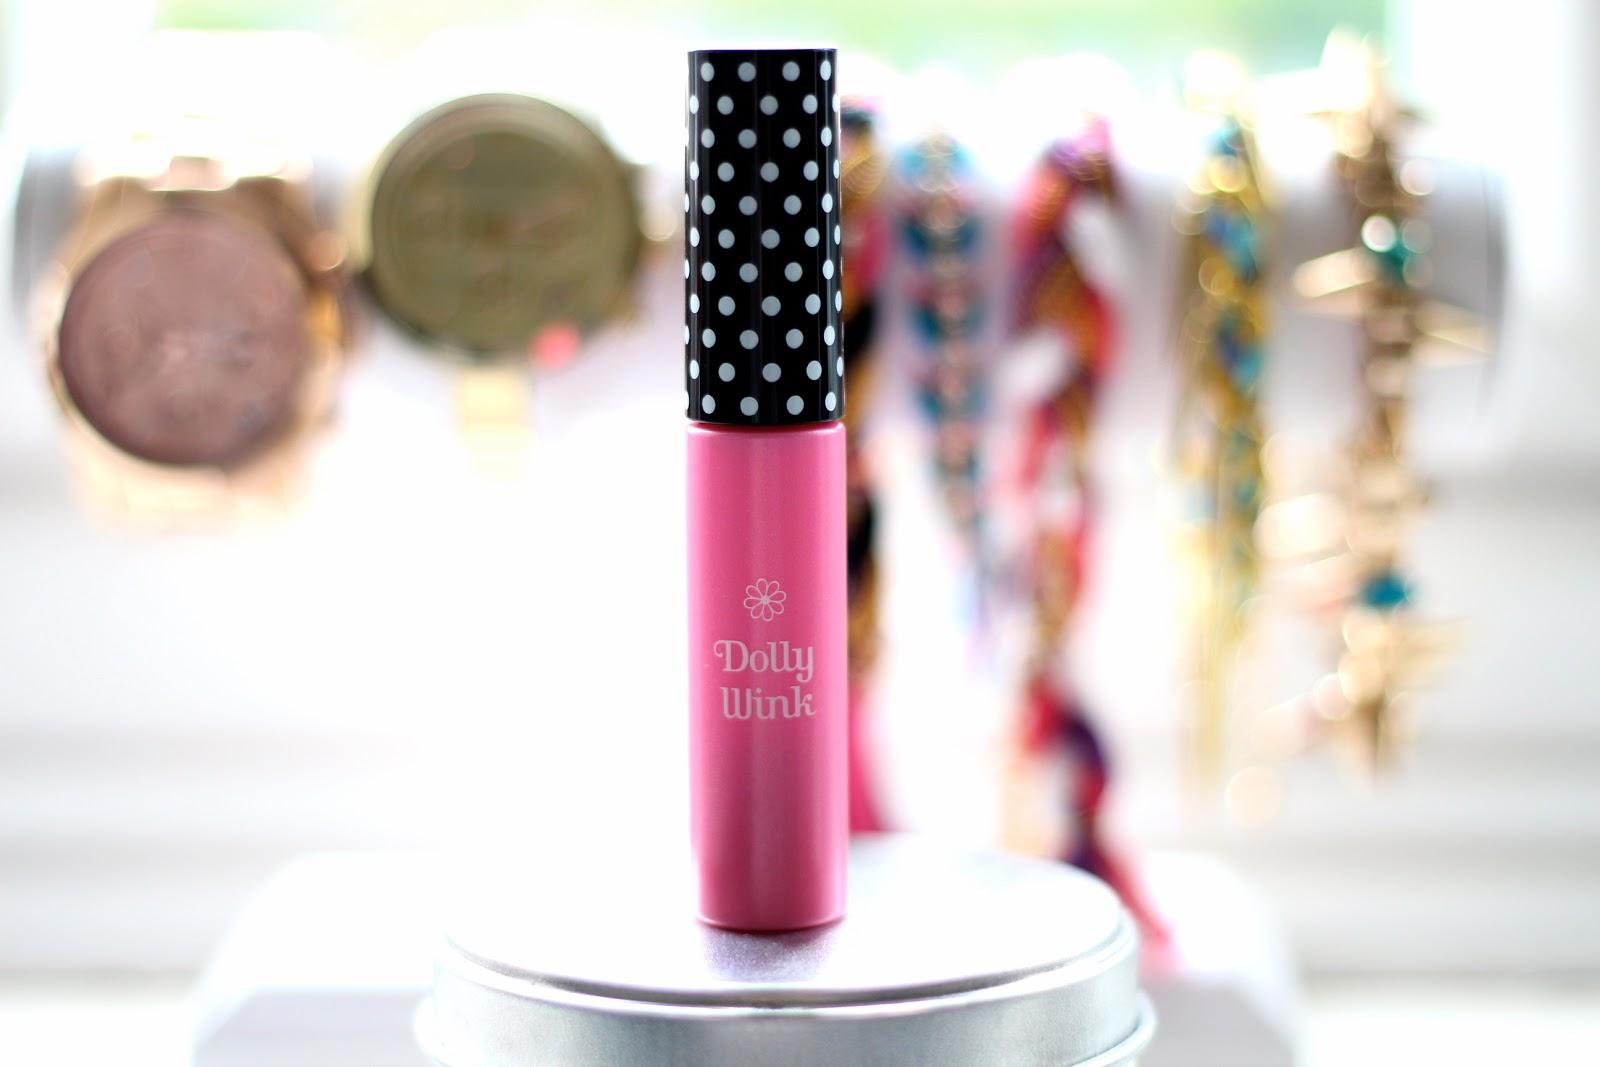 Review Dolly Wink Eyelash Fix Stylesuzi